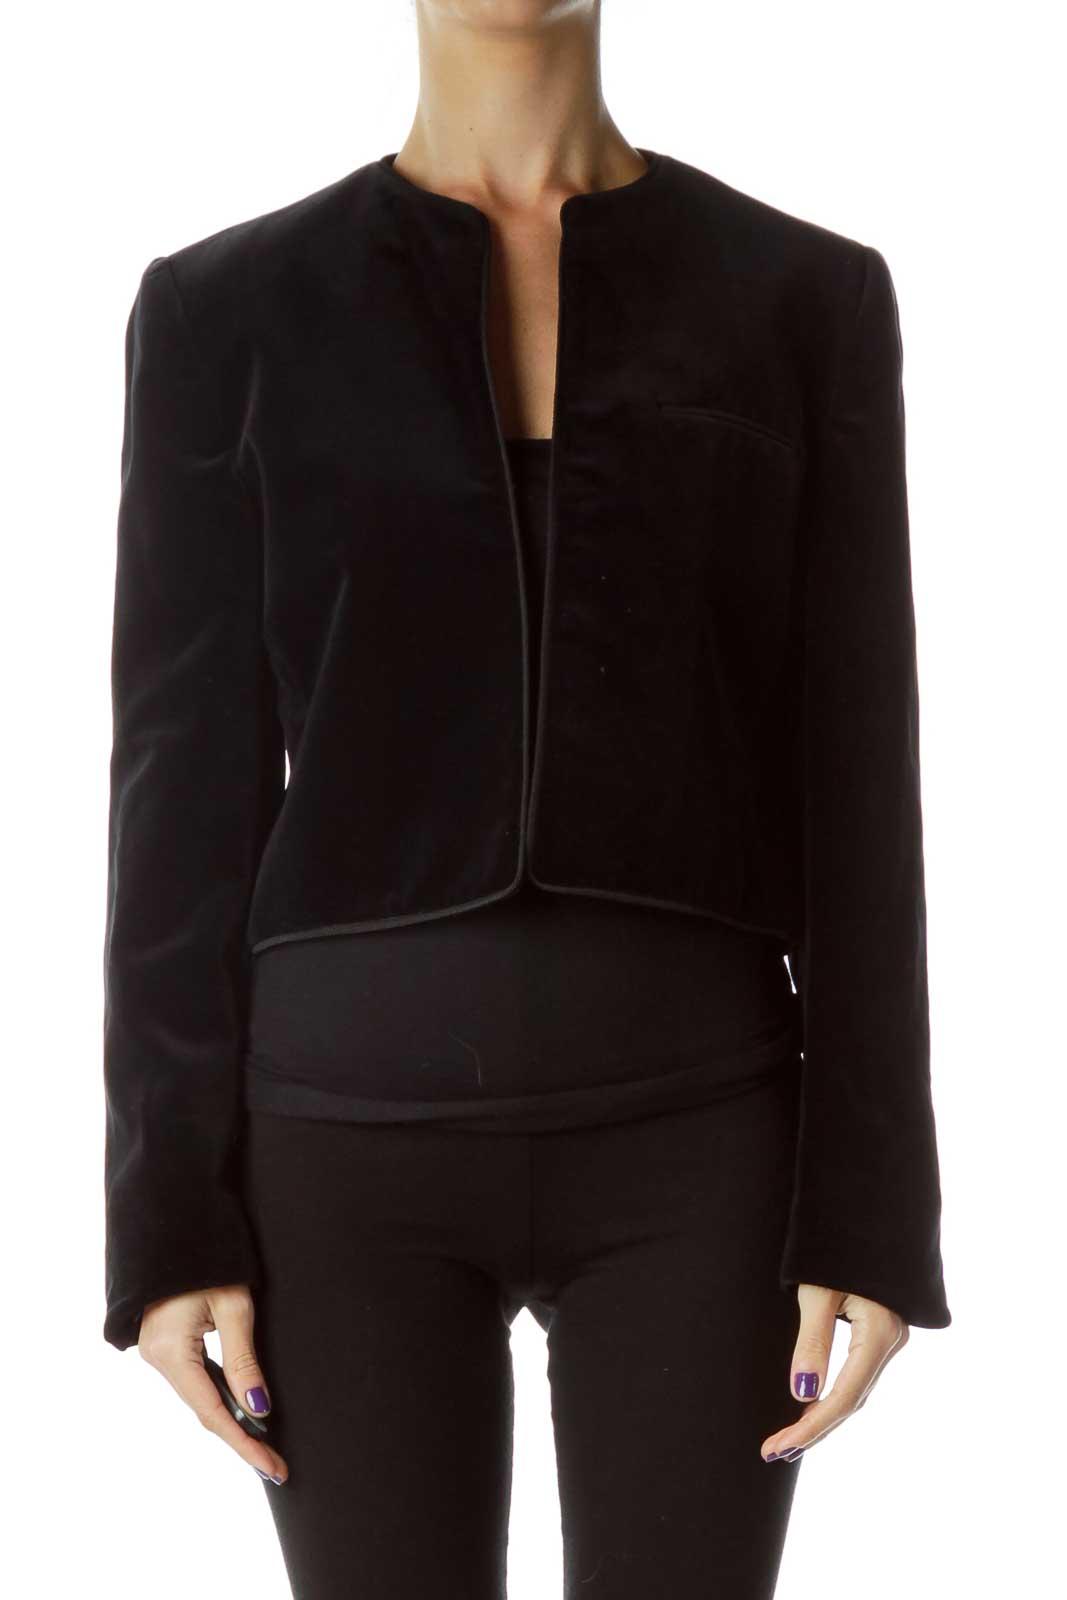 Navy Velvet Jacket with Trim Detail Front